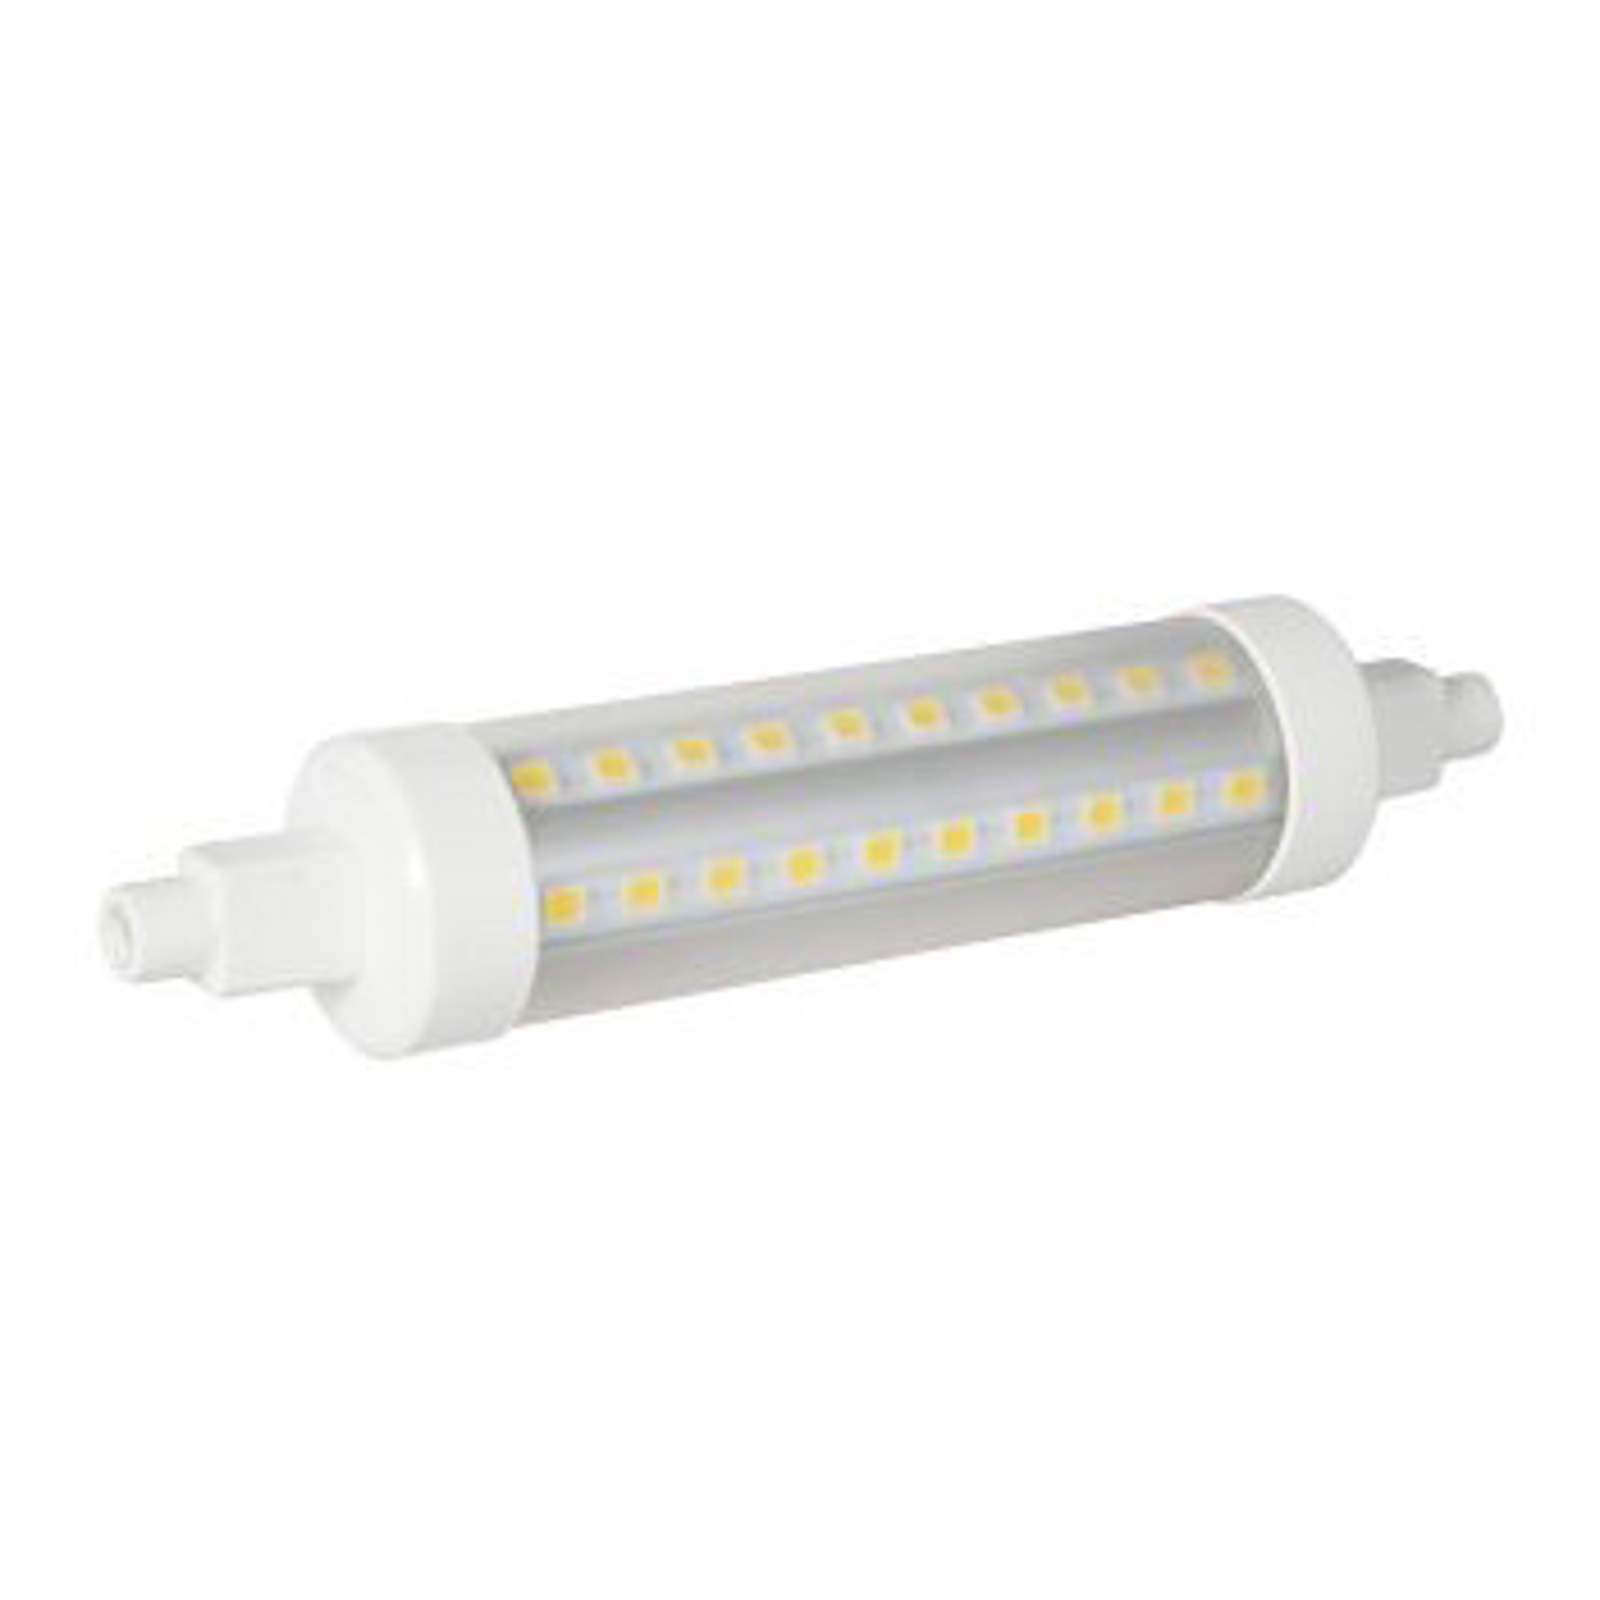 R7s 8W Ledlamp VEO in staafvorm, warmwit